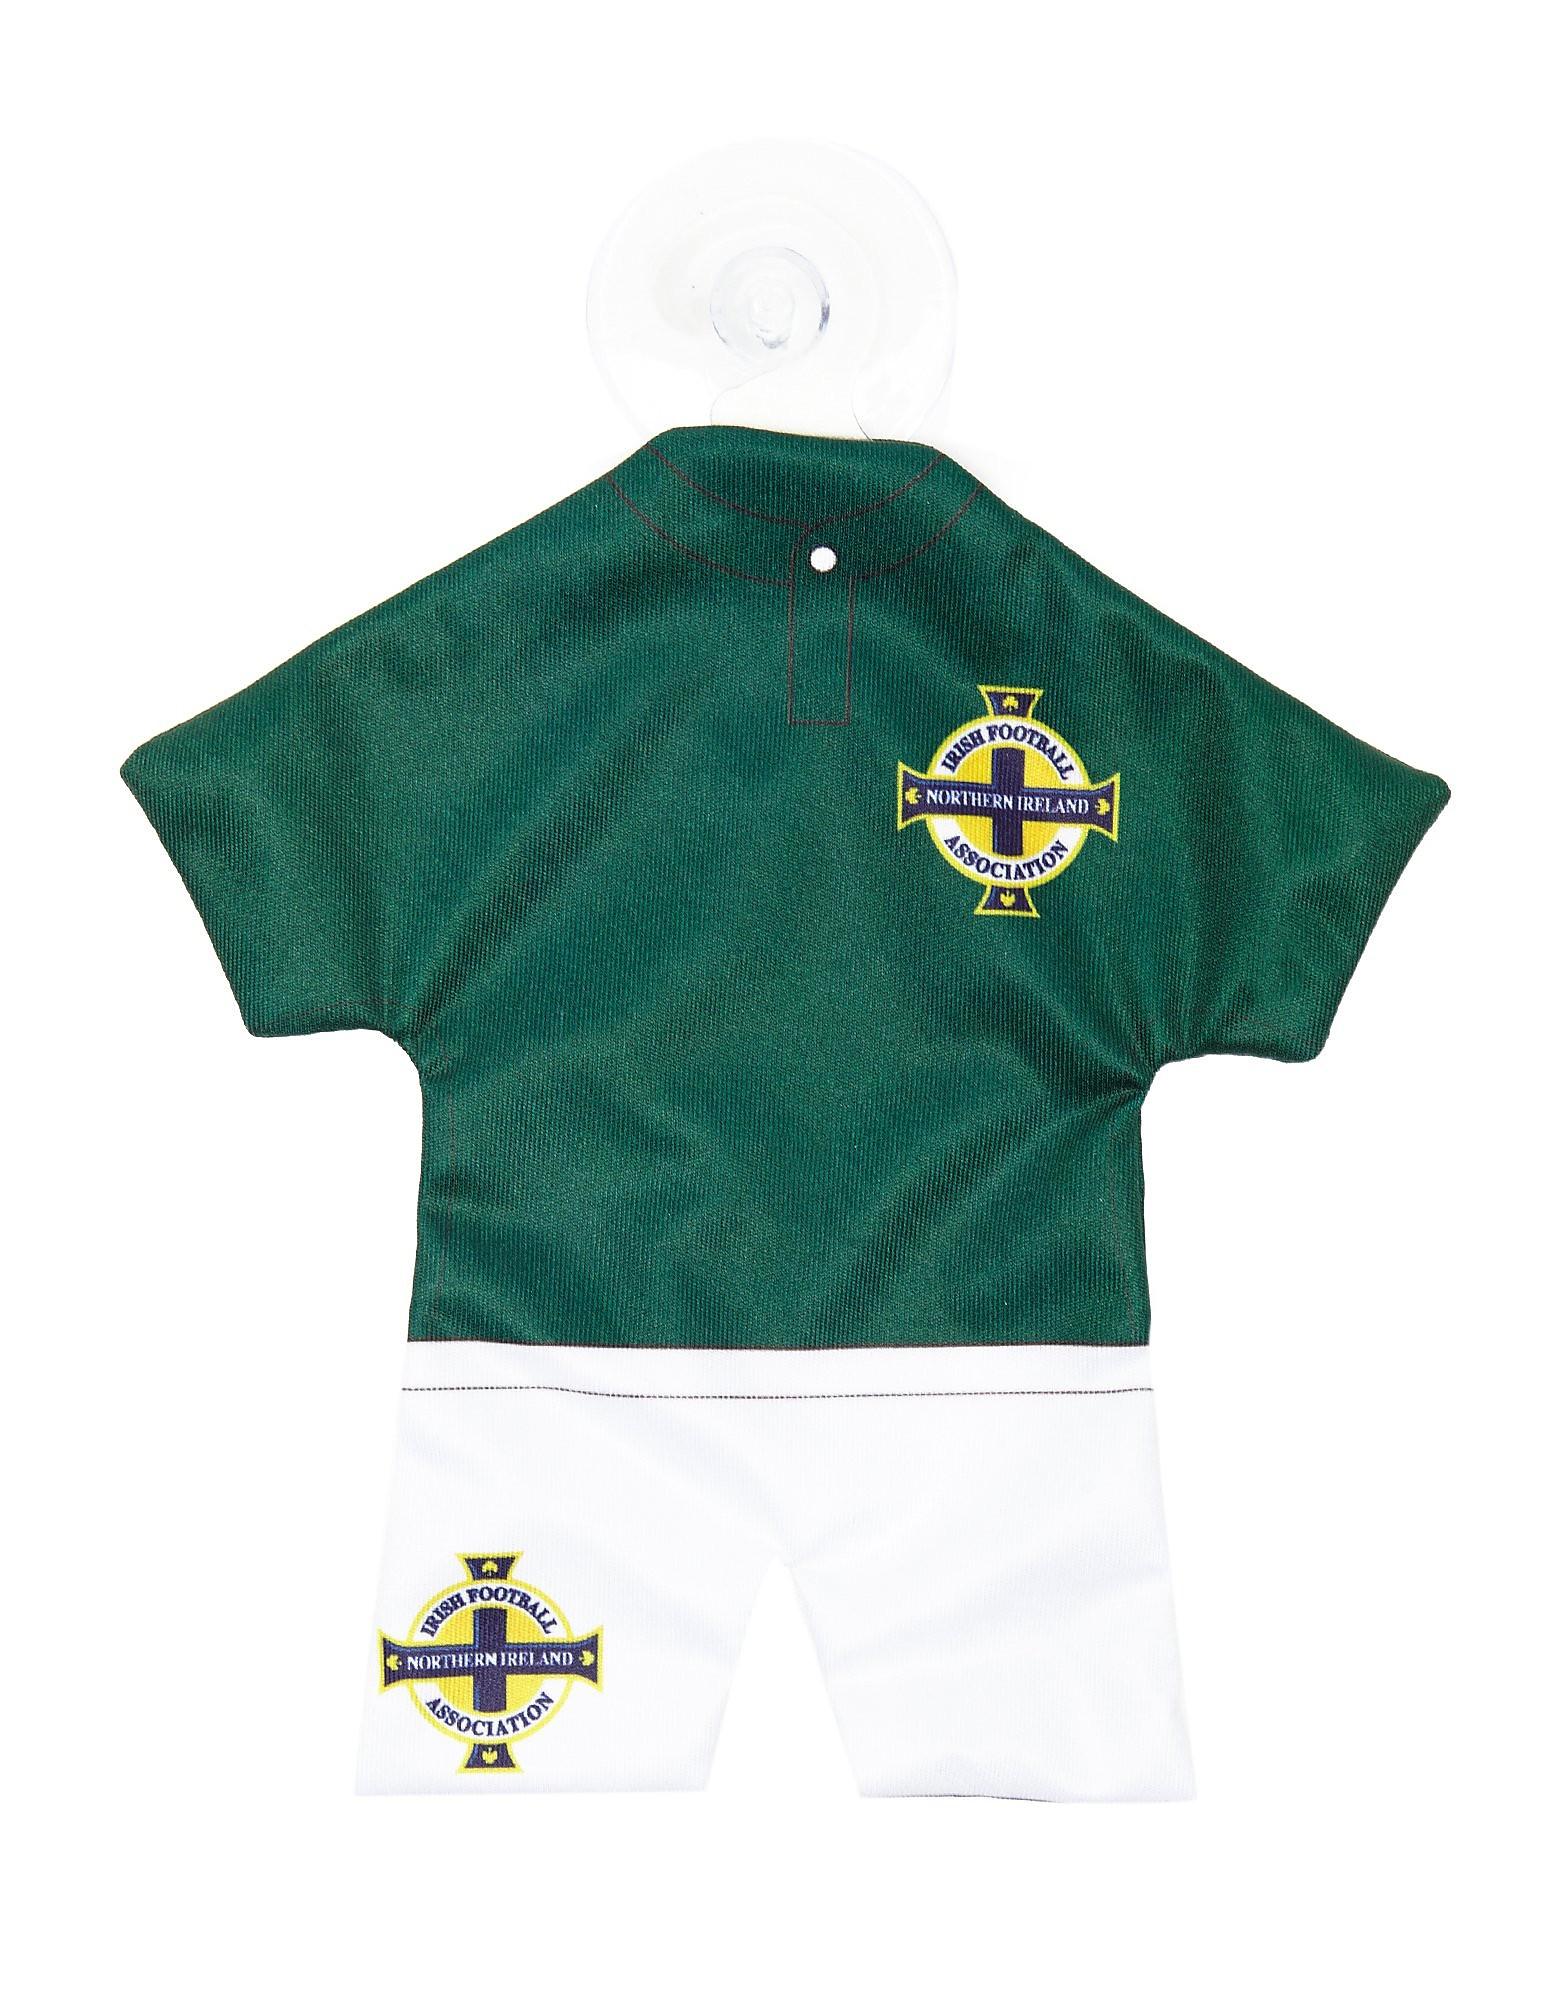 Official Team Northern Ireland Home Kit Car Hanger